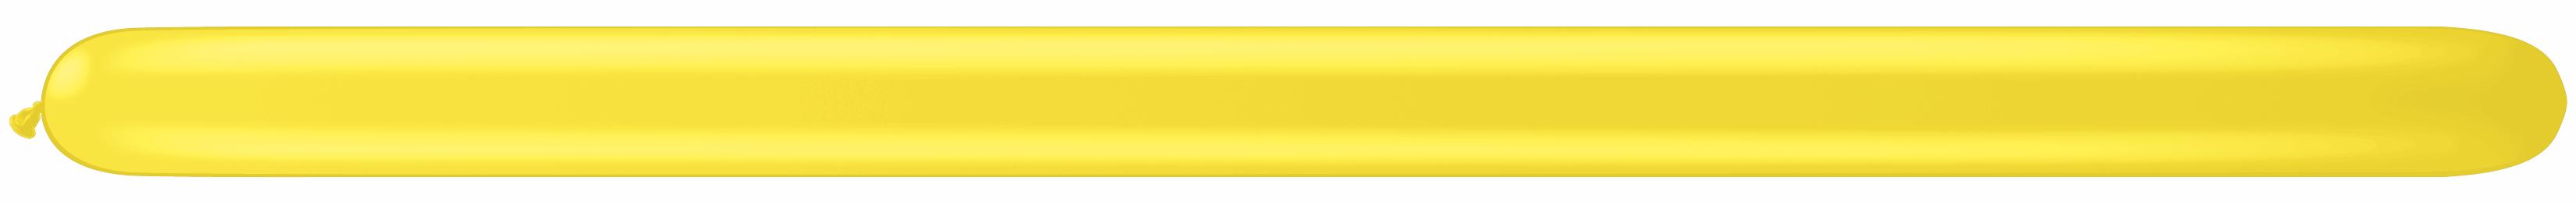 350Q Latex Balloons (100 Count) Yellow